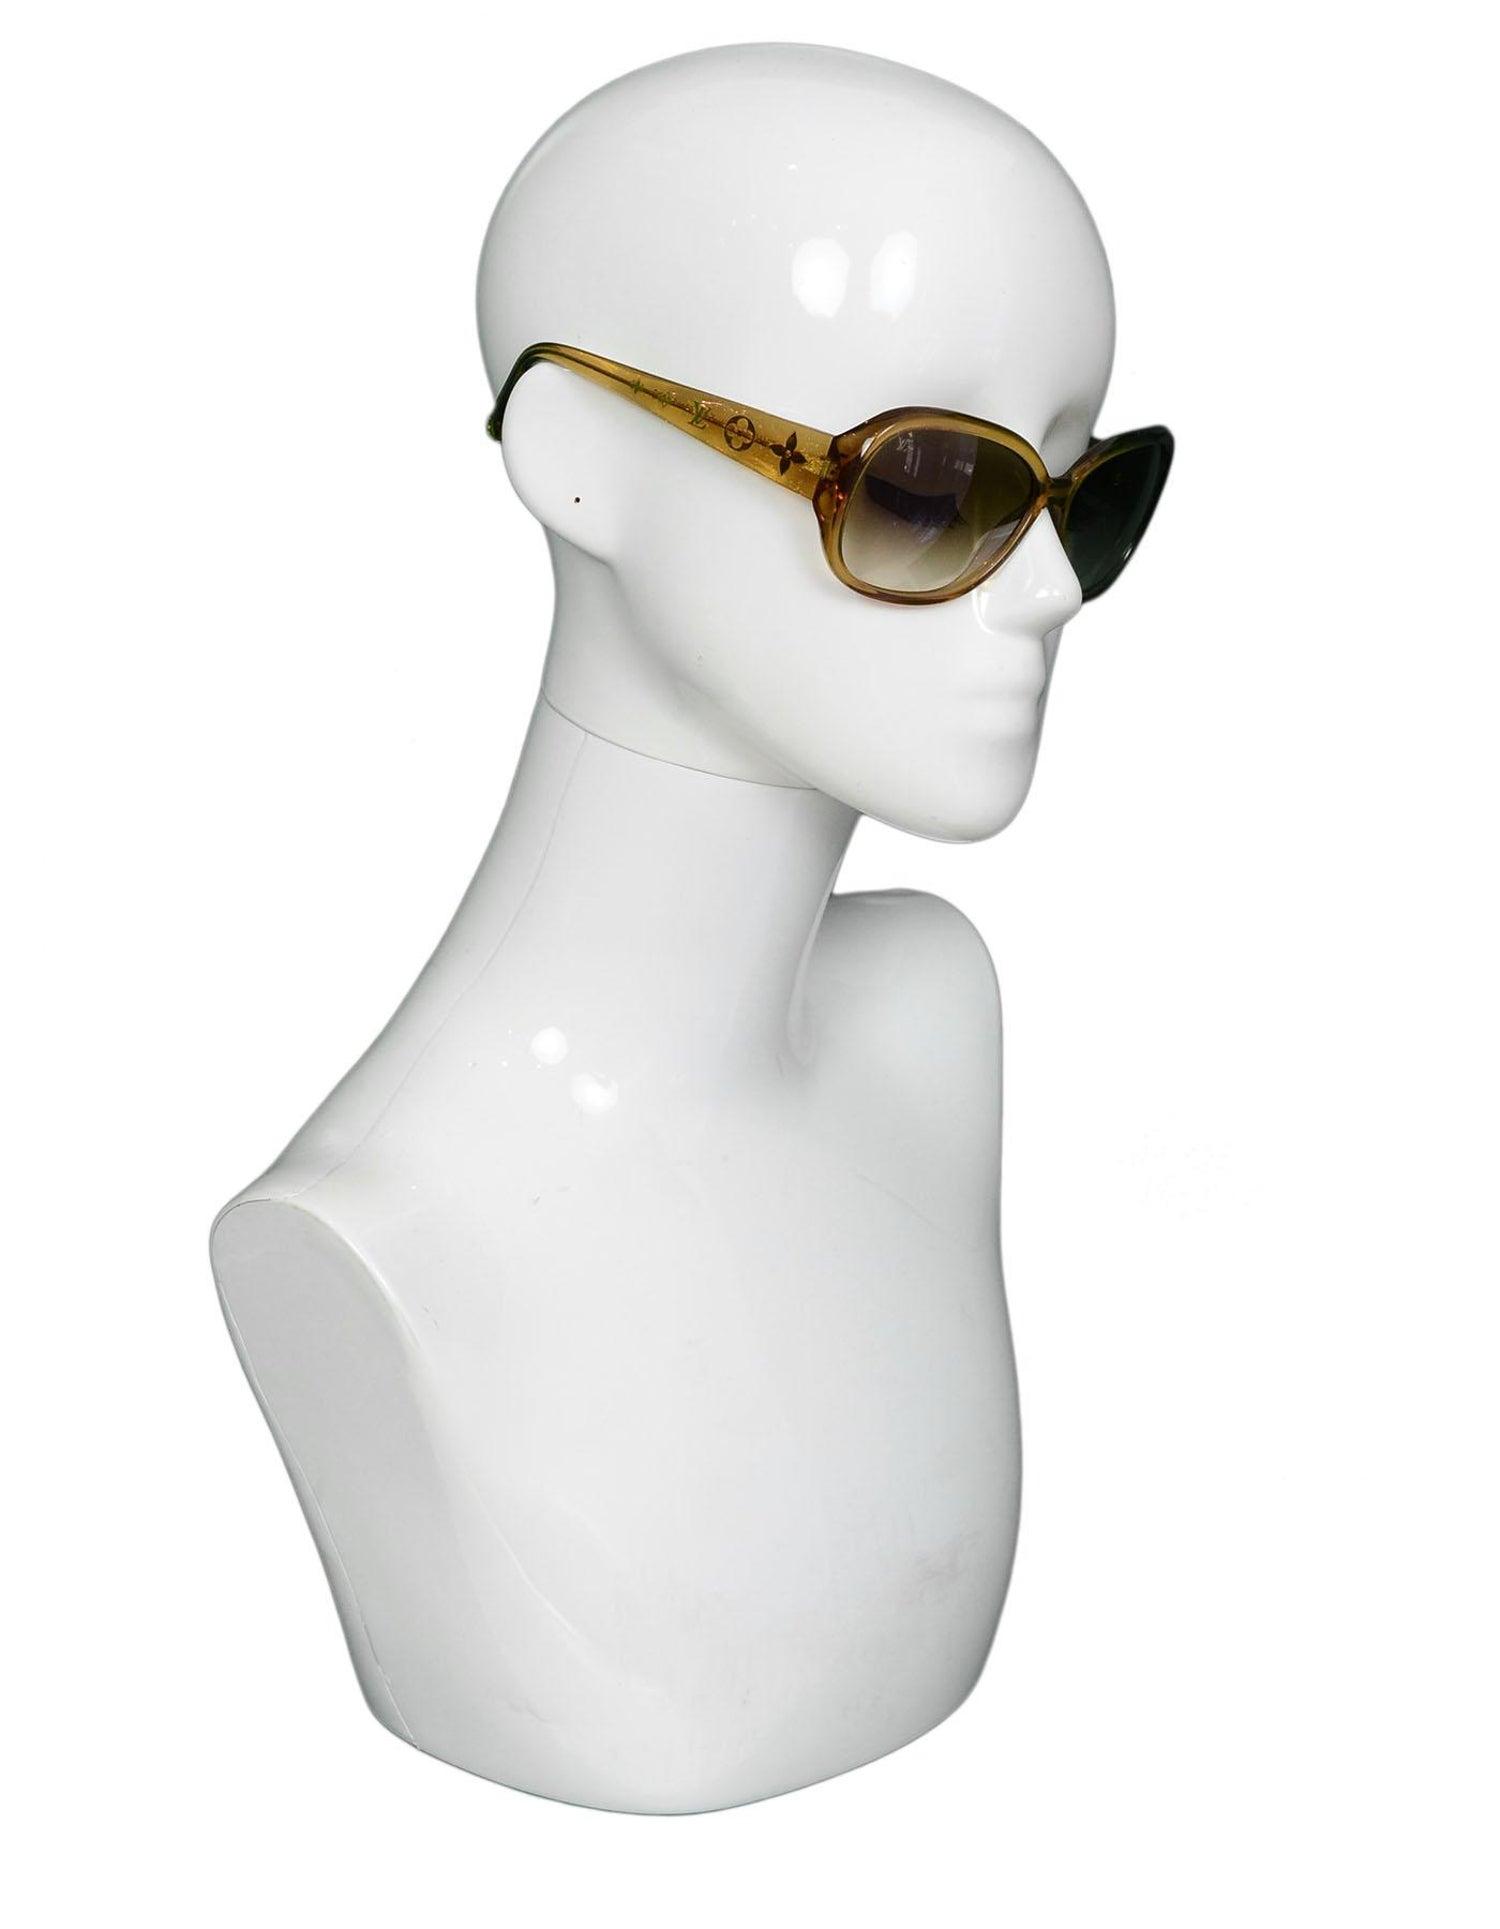 15b273e1c0e01 Louis Vuitton Z0460W Honey Glitter Acetate Obsession GM Sunglasses For Sale  at 1stdibs